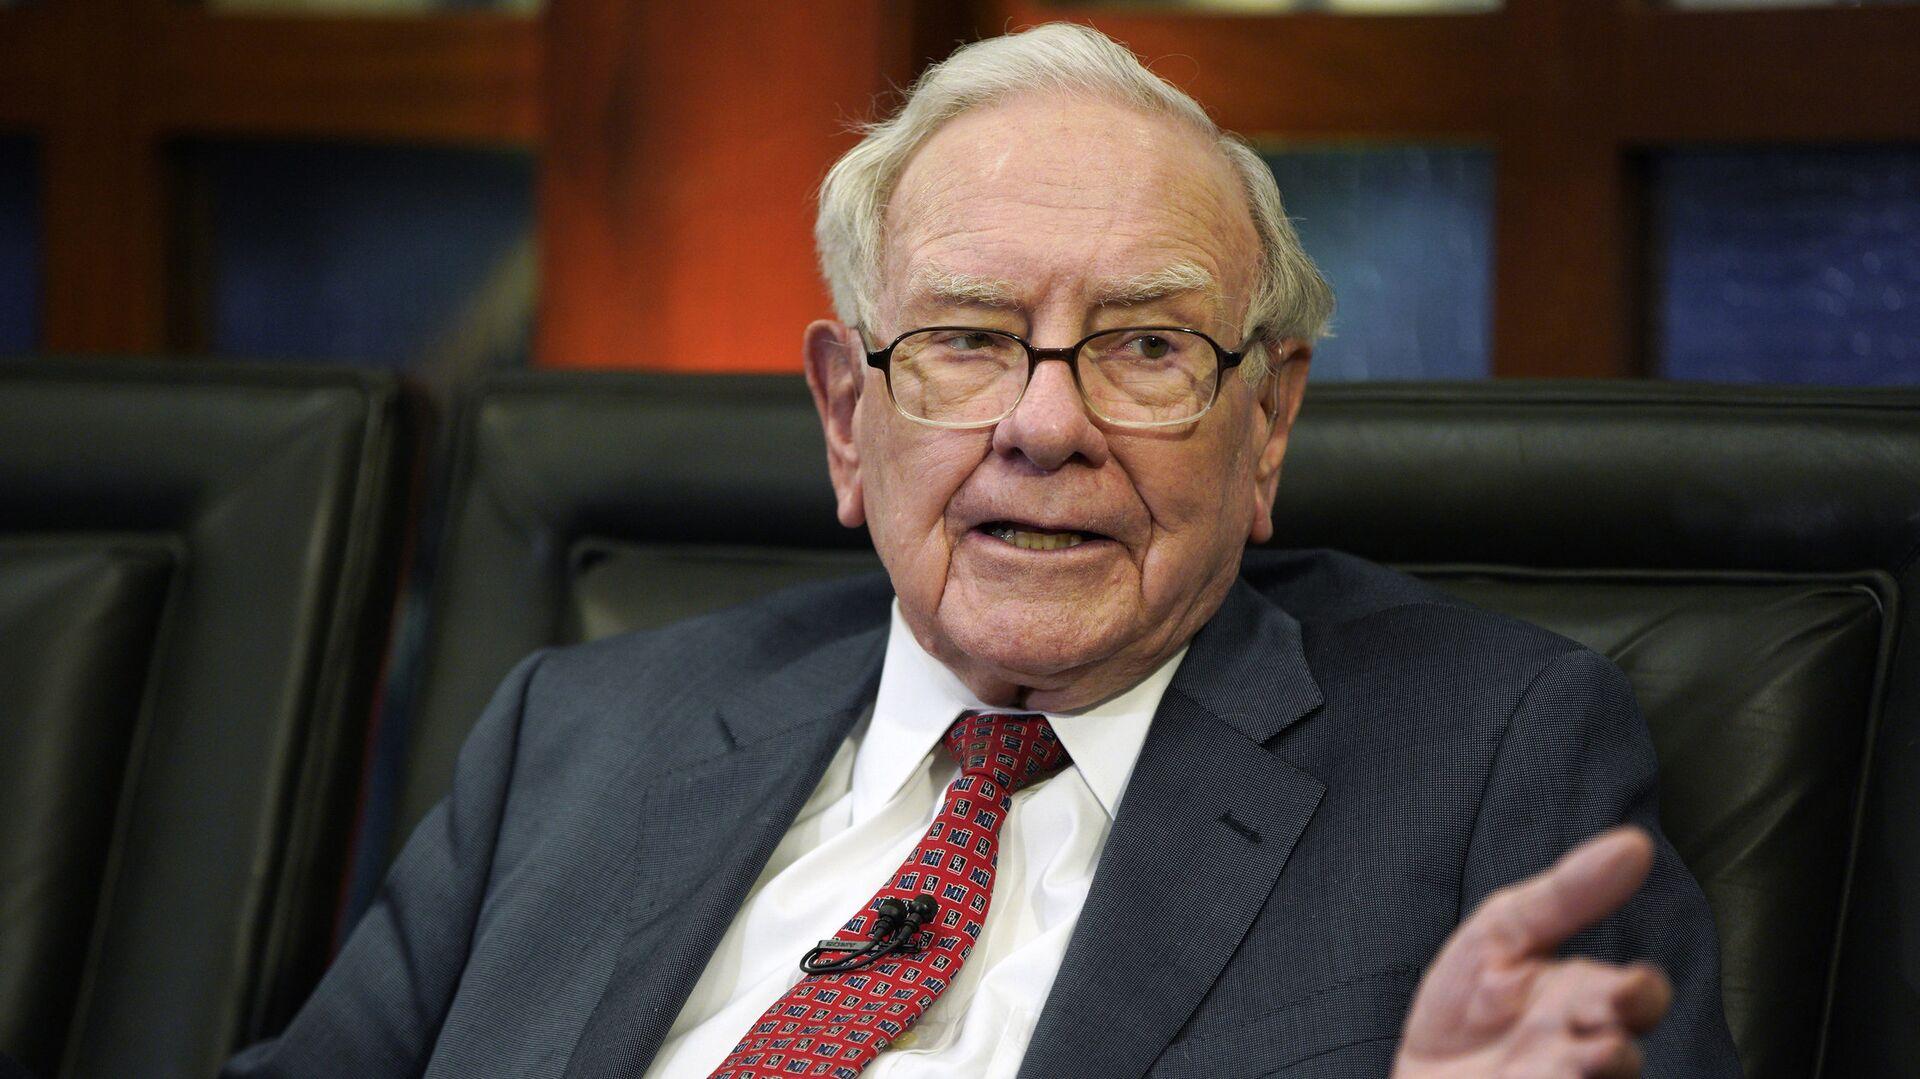 Warren Buffett, multimillonario estadounidense (archivo) - Sputnik Mundo, 1920, 01.05.2021